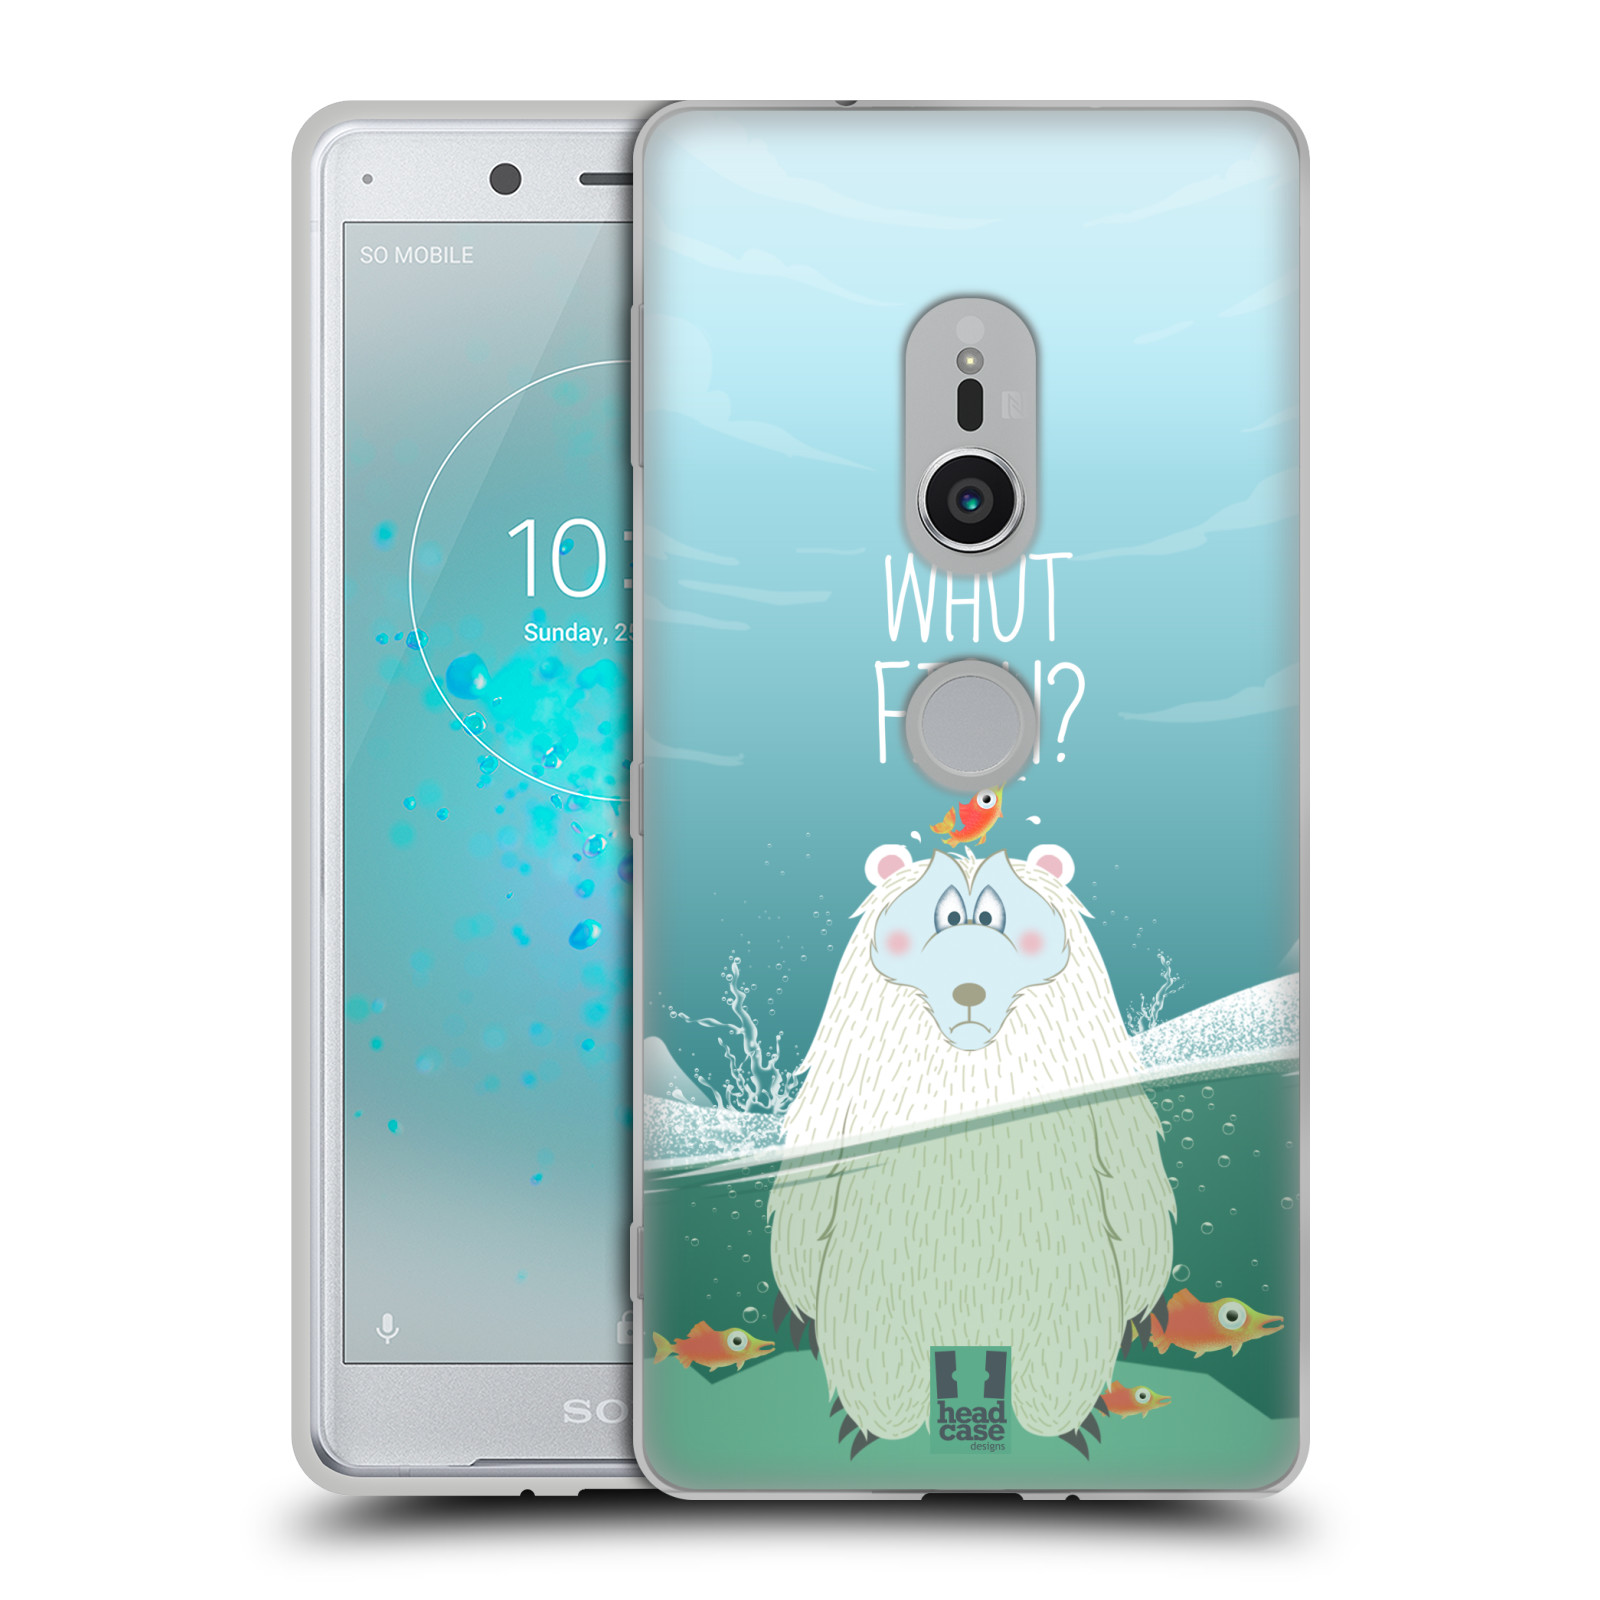 Silikonové pouzdro na mobil Sony Xperia XZ2 - Head Case - Medvěd Whut Fish?